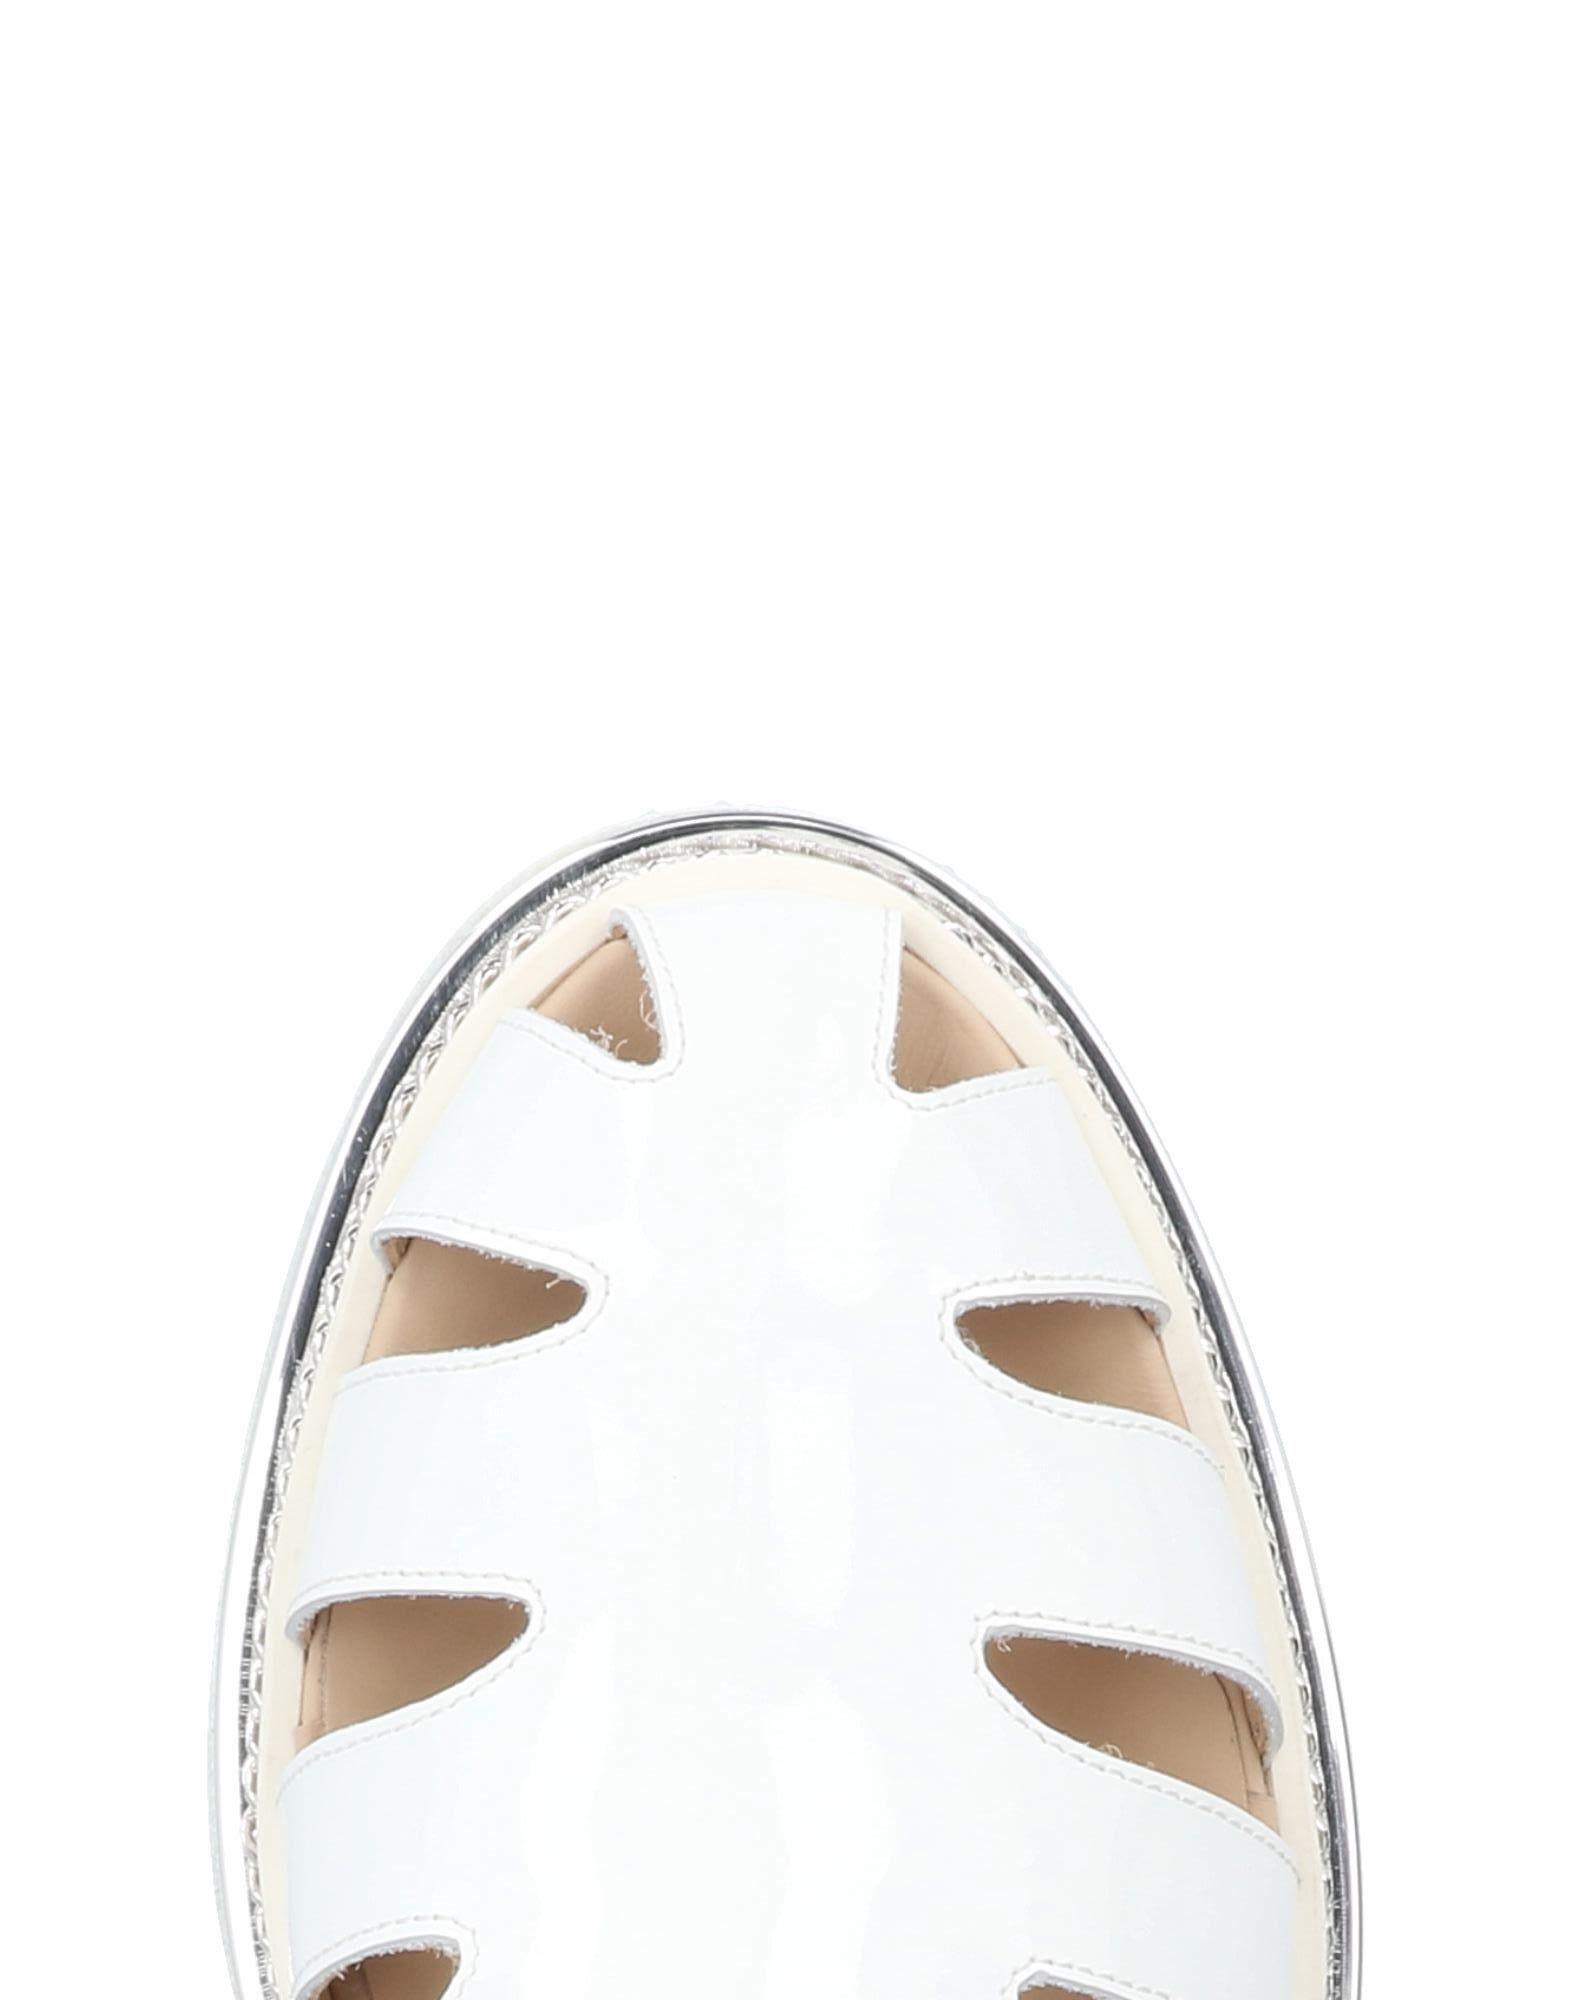 Gut um billige Schuhe zu tragenAlberto 11426339HI Guardiani Mokassins Damen  11426339HI tragenAlberto a9bfce